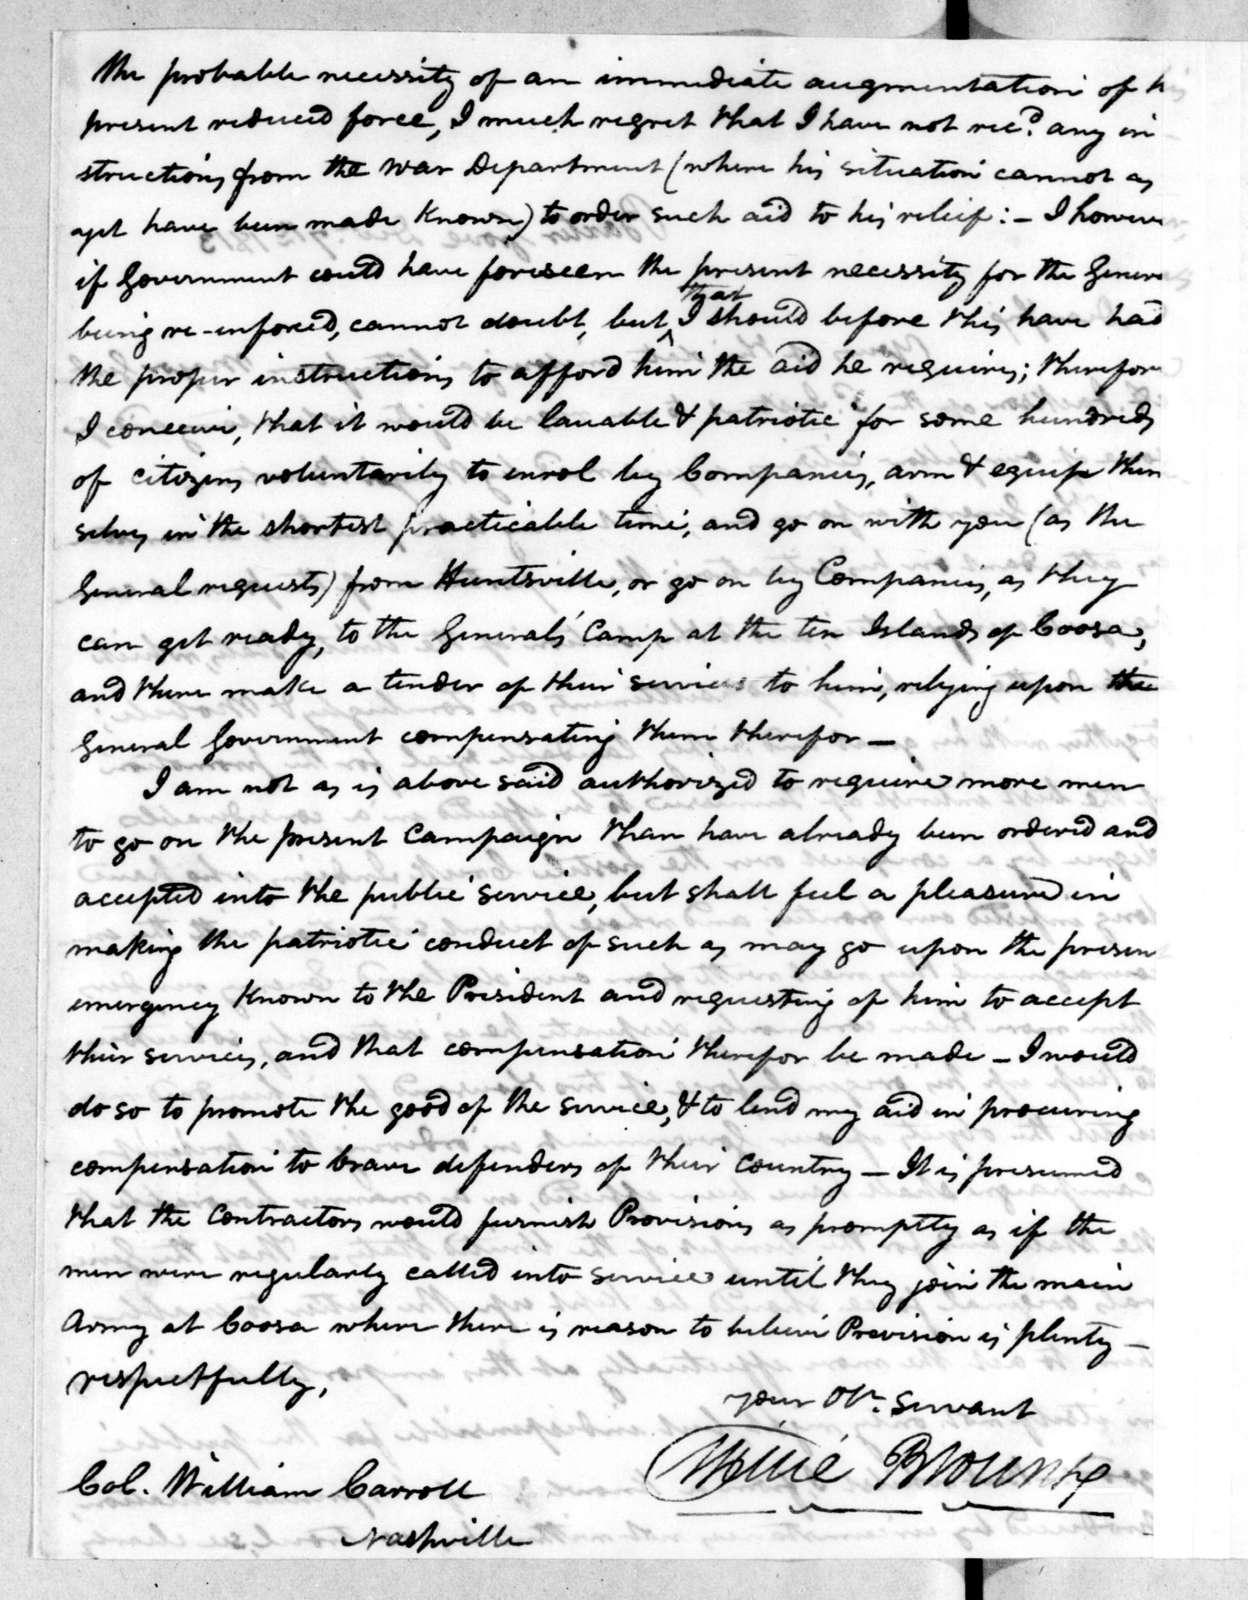 Willie Blount to William Carroll, December 7, 1813